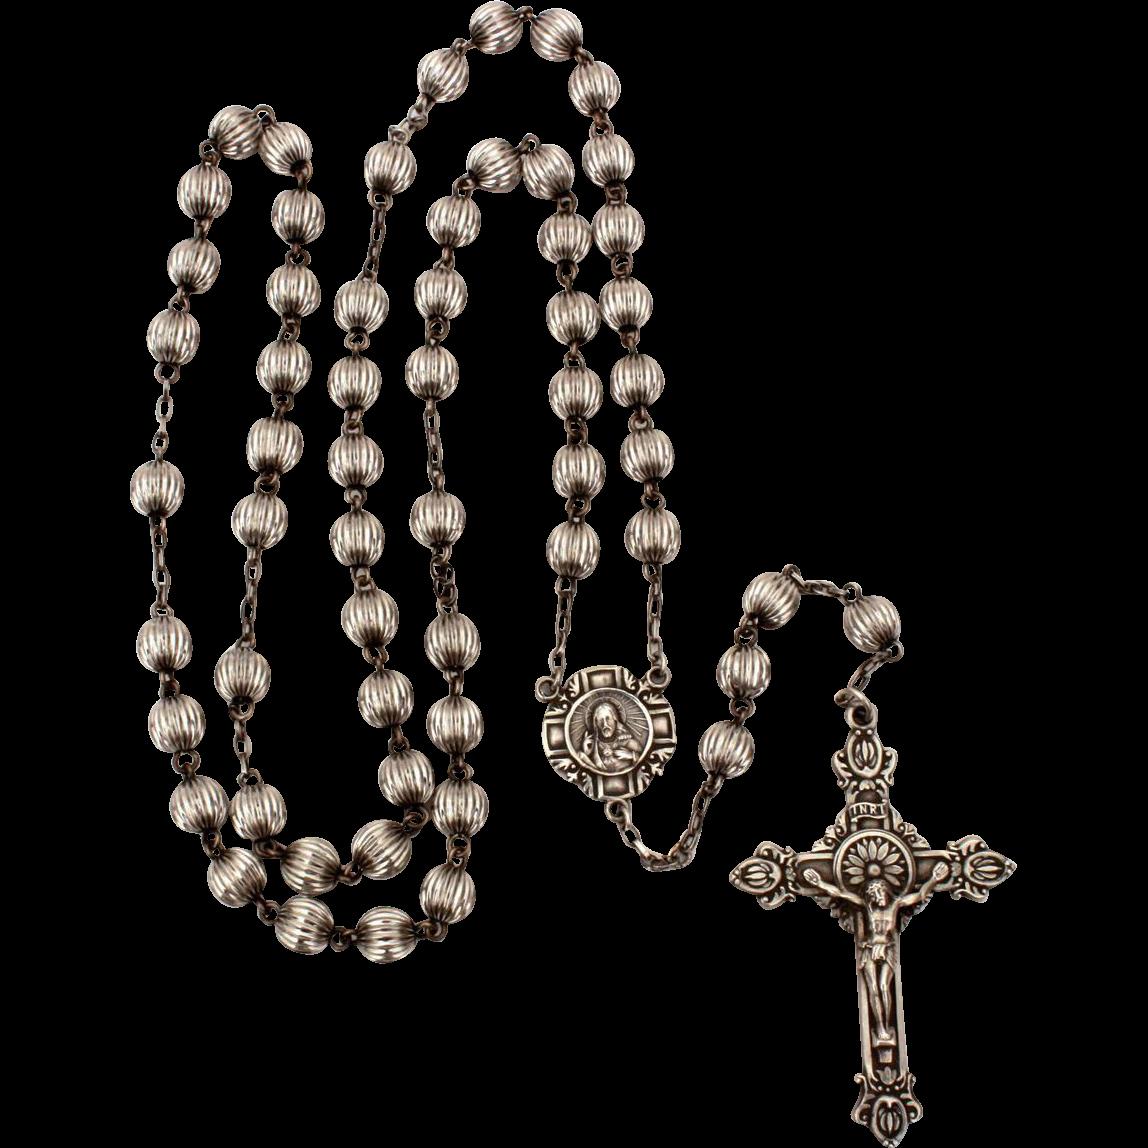 Jesus And Rosary Png & Free Jesus And Rosary.png Transparent.